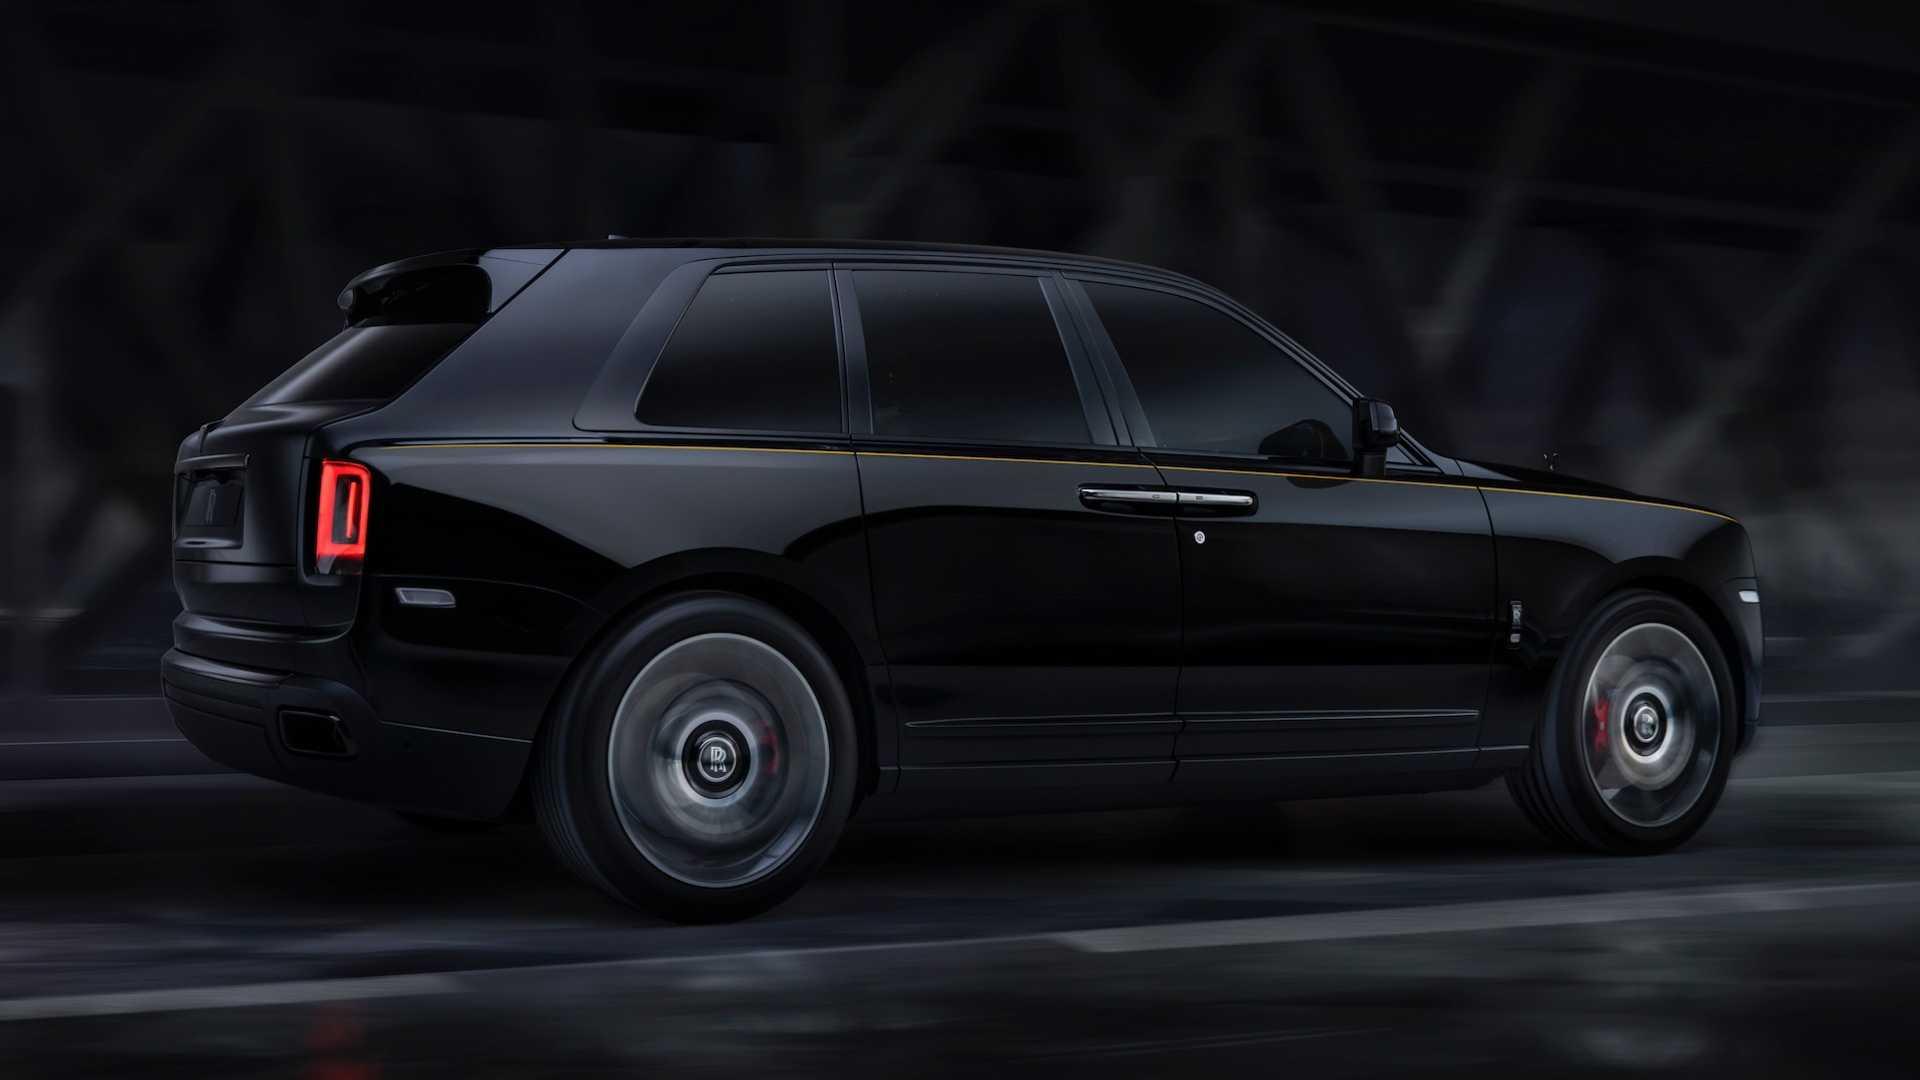 Кроссовер Rolls-Royce стал мощнее и богаче 2